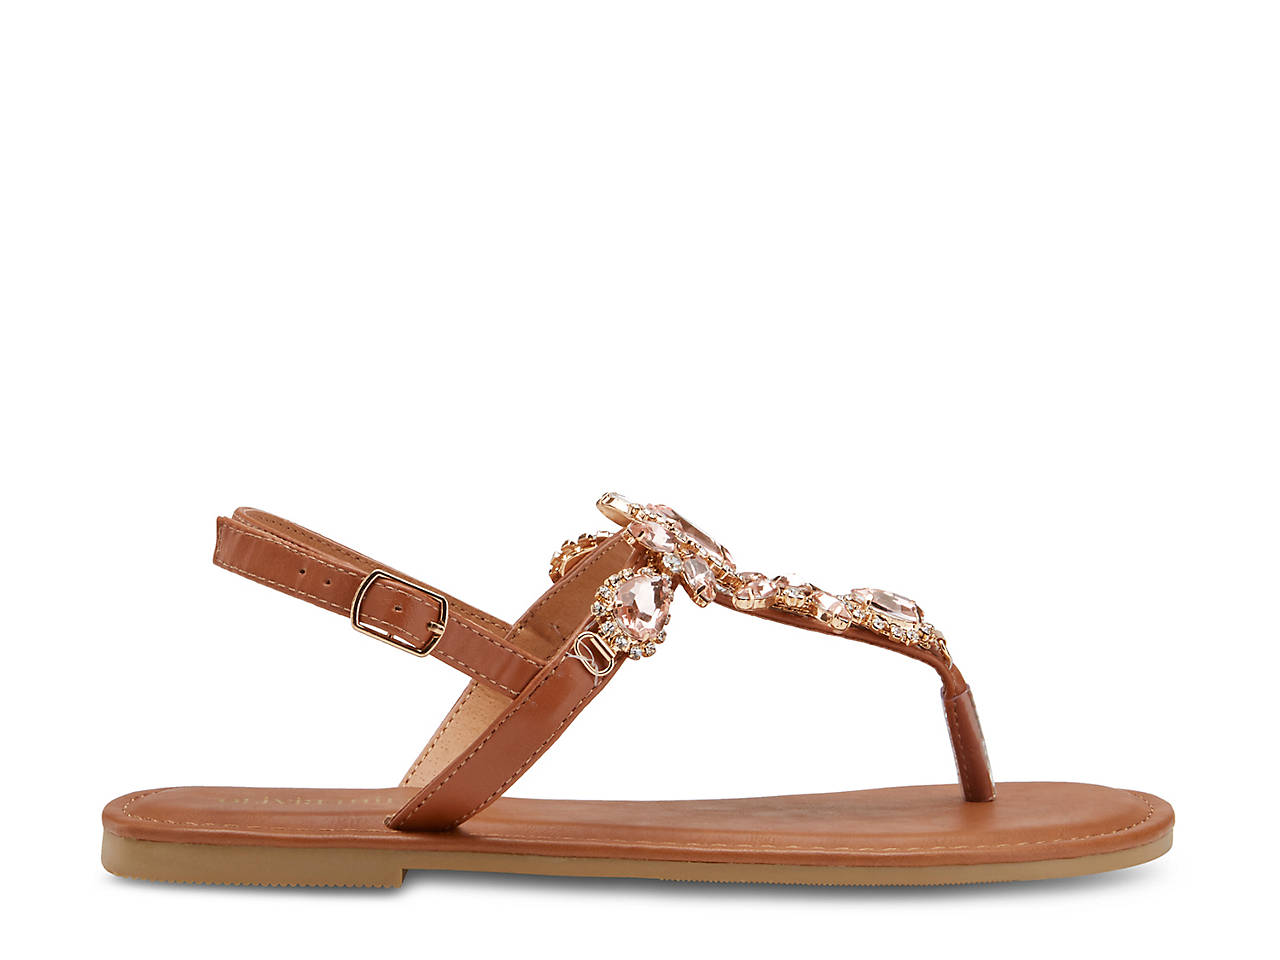 5950a2284a9 Olivia Miller Lux Sandal Women s Shoes